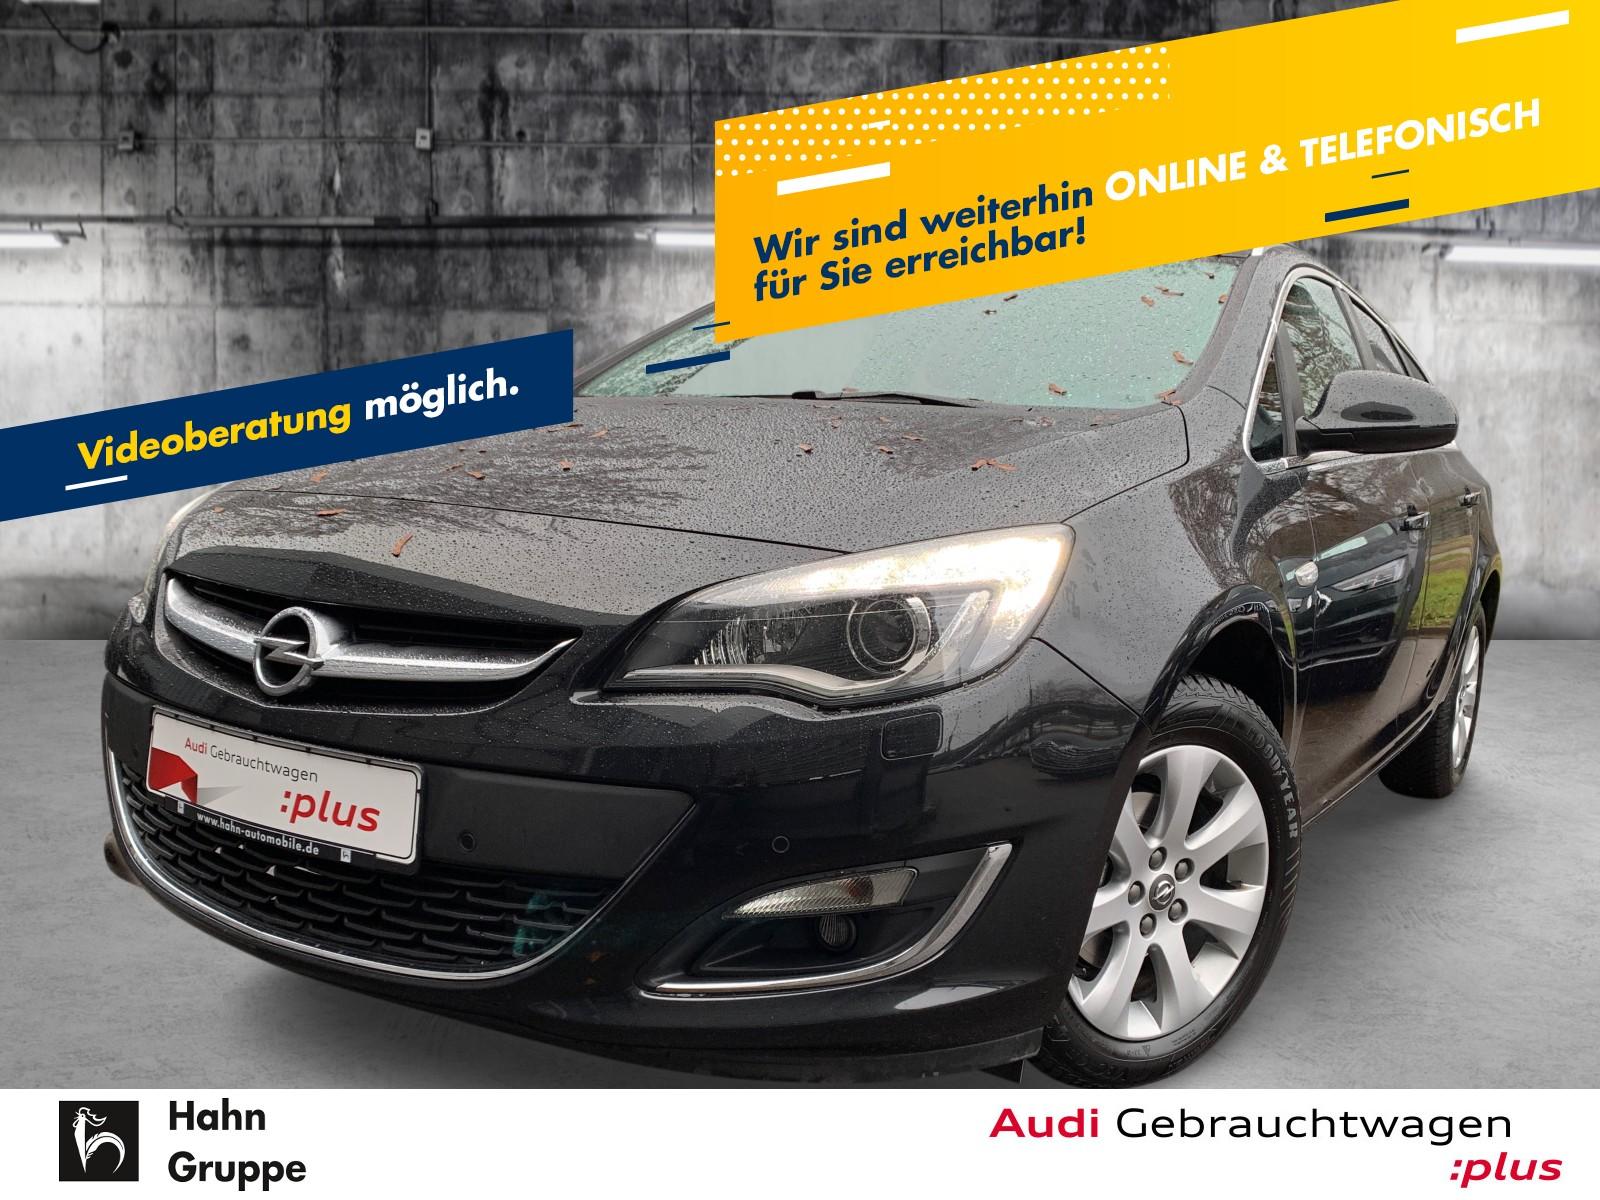 Opel Astra Sports Tourer 1.4Turbo Xen Navi Einparkh Sitzh Bluetooth, Jahr 2014, Benzin